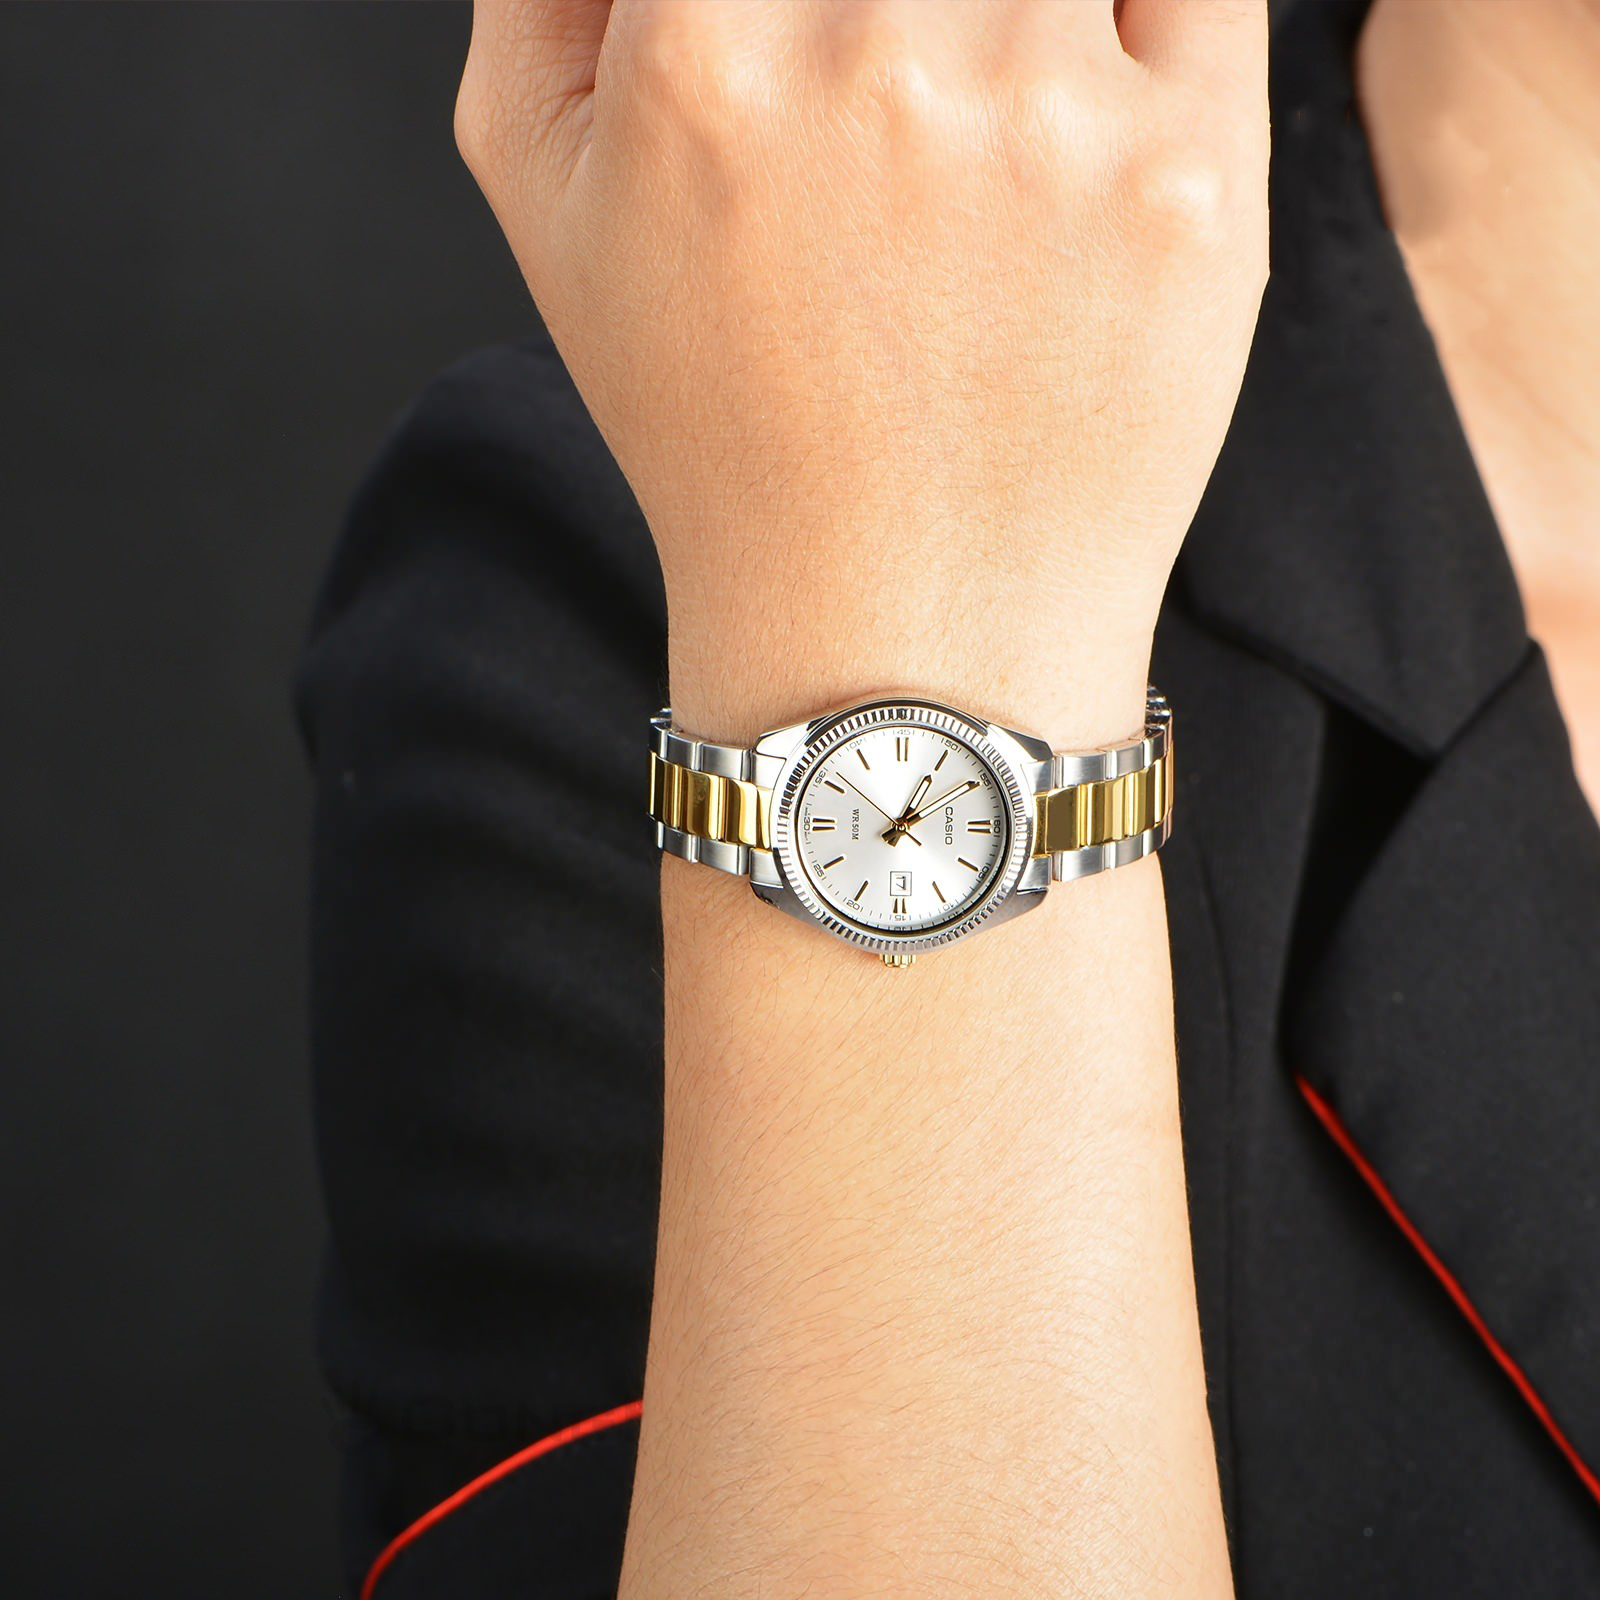 Đồng hồ nữ dây kim loại Casio LTP-1302SG-7AVDF